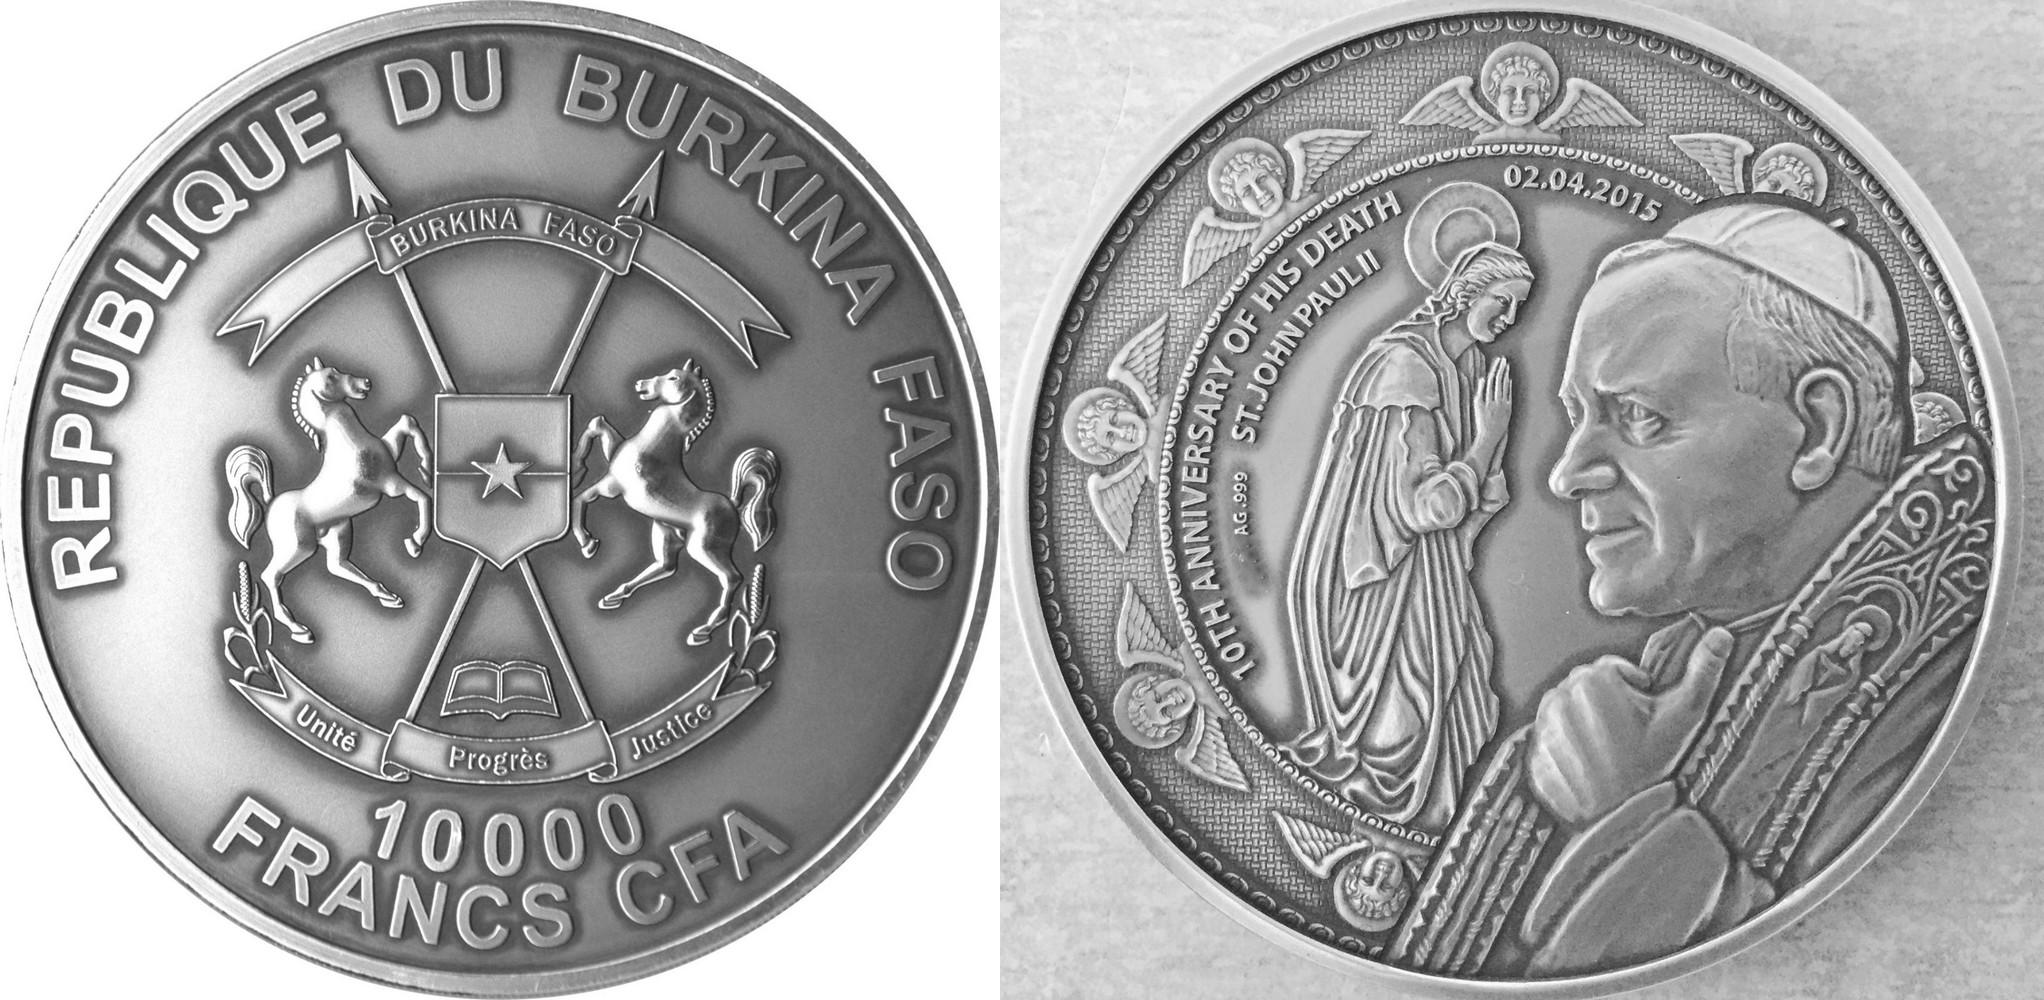 burkina faso 2015 10 ans mort jean paul II.jpg